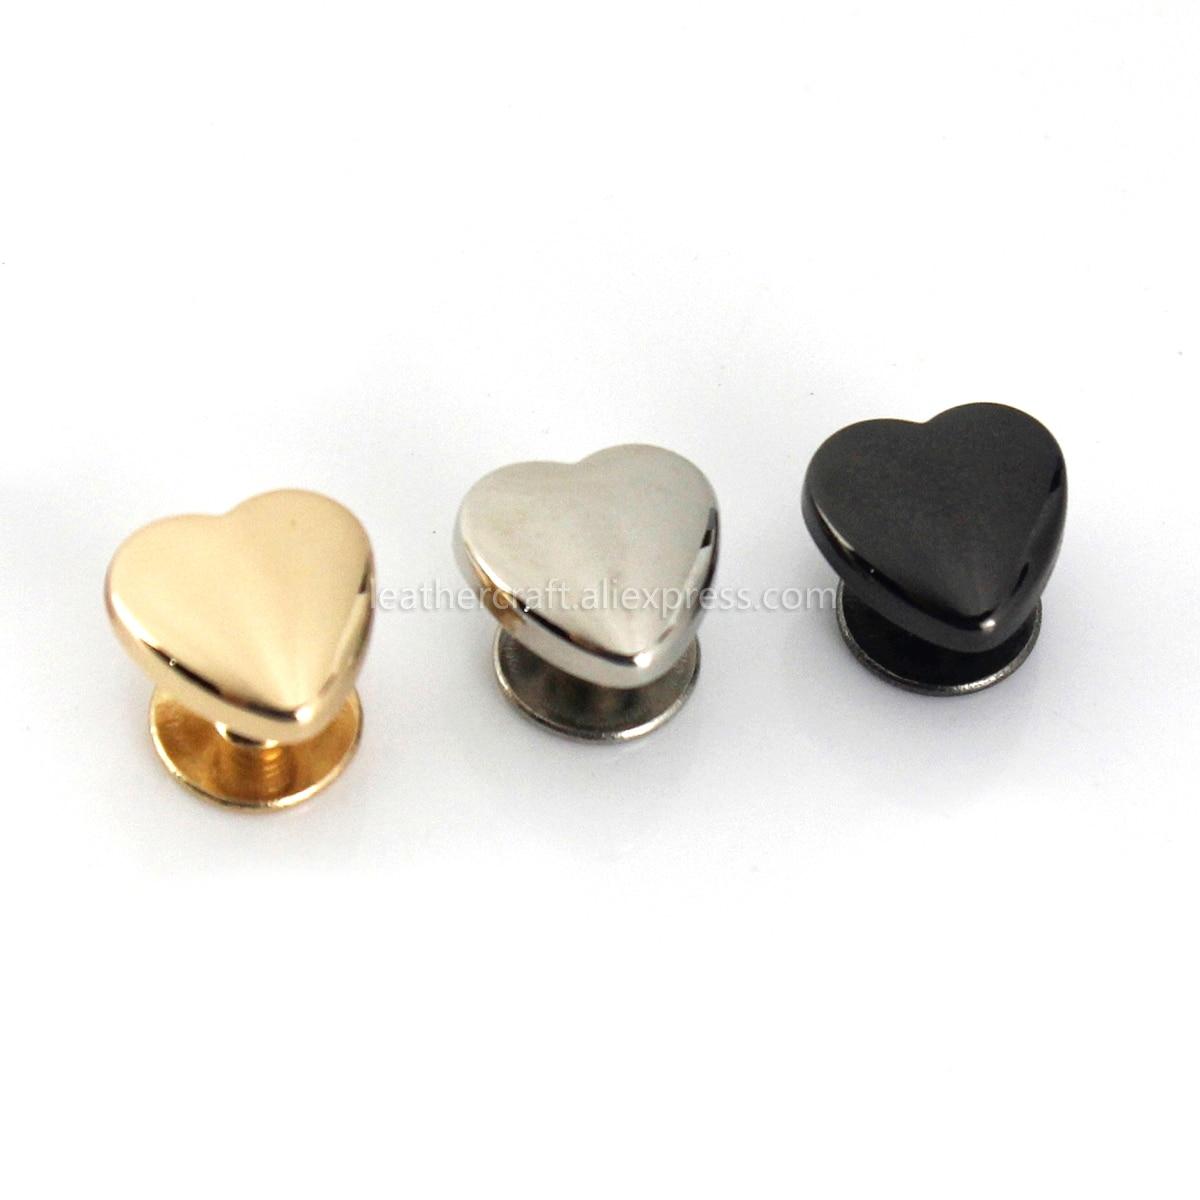 10pcs Heart Shape Metal Screw Back Rivets for Leather Studs Nail Garment Leather Craft Belt Wallet B